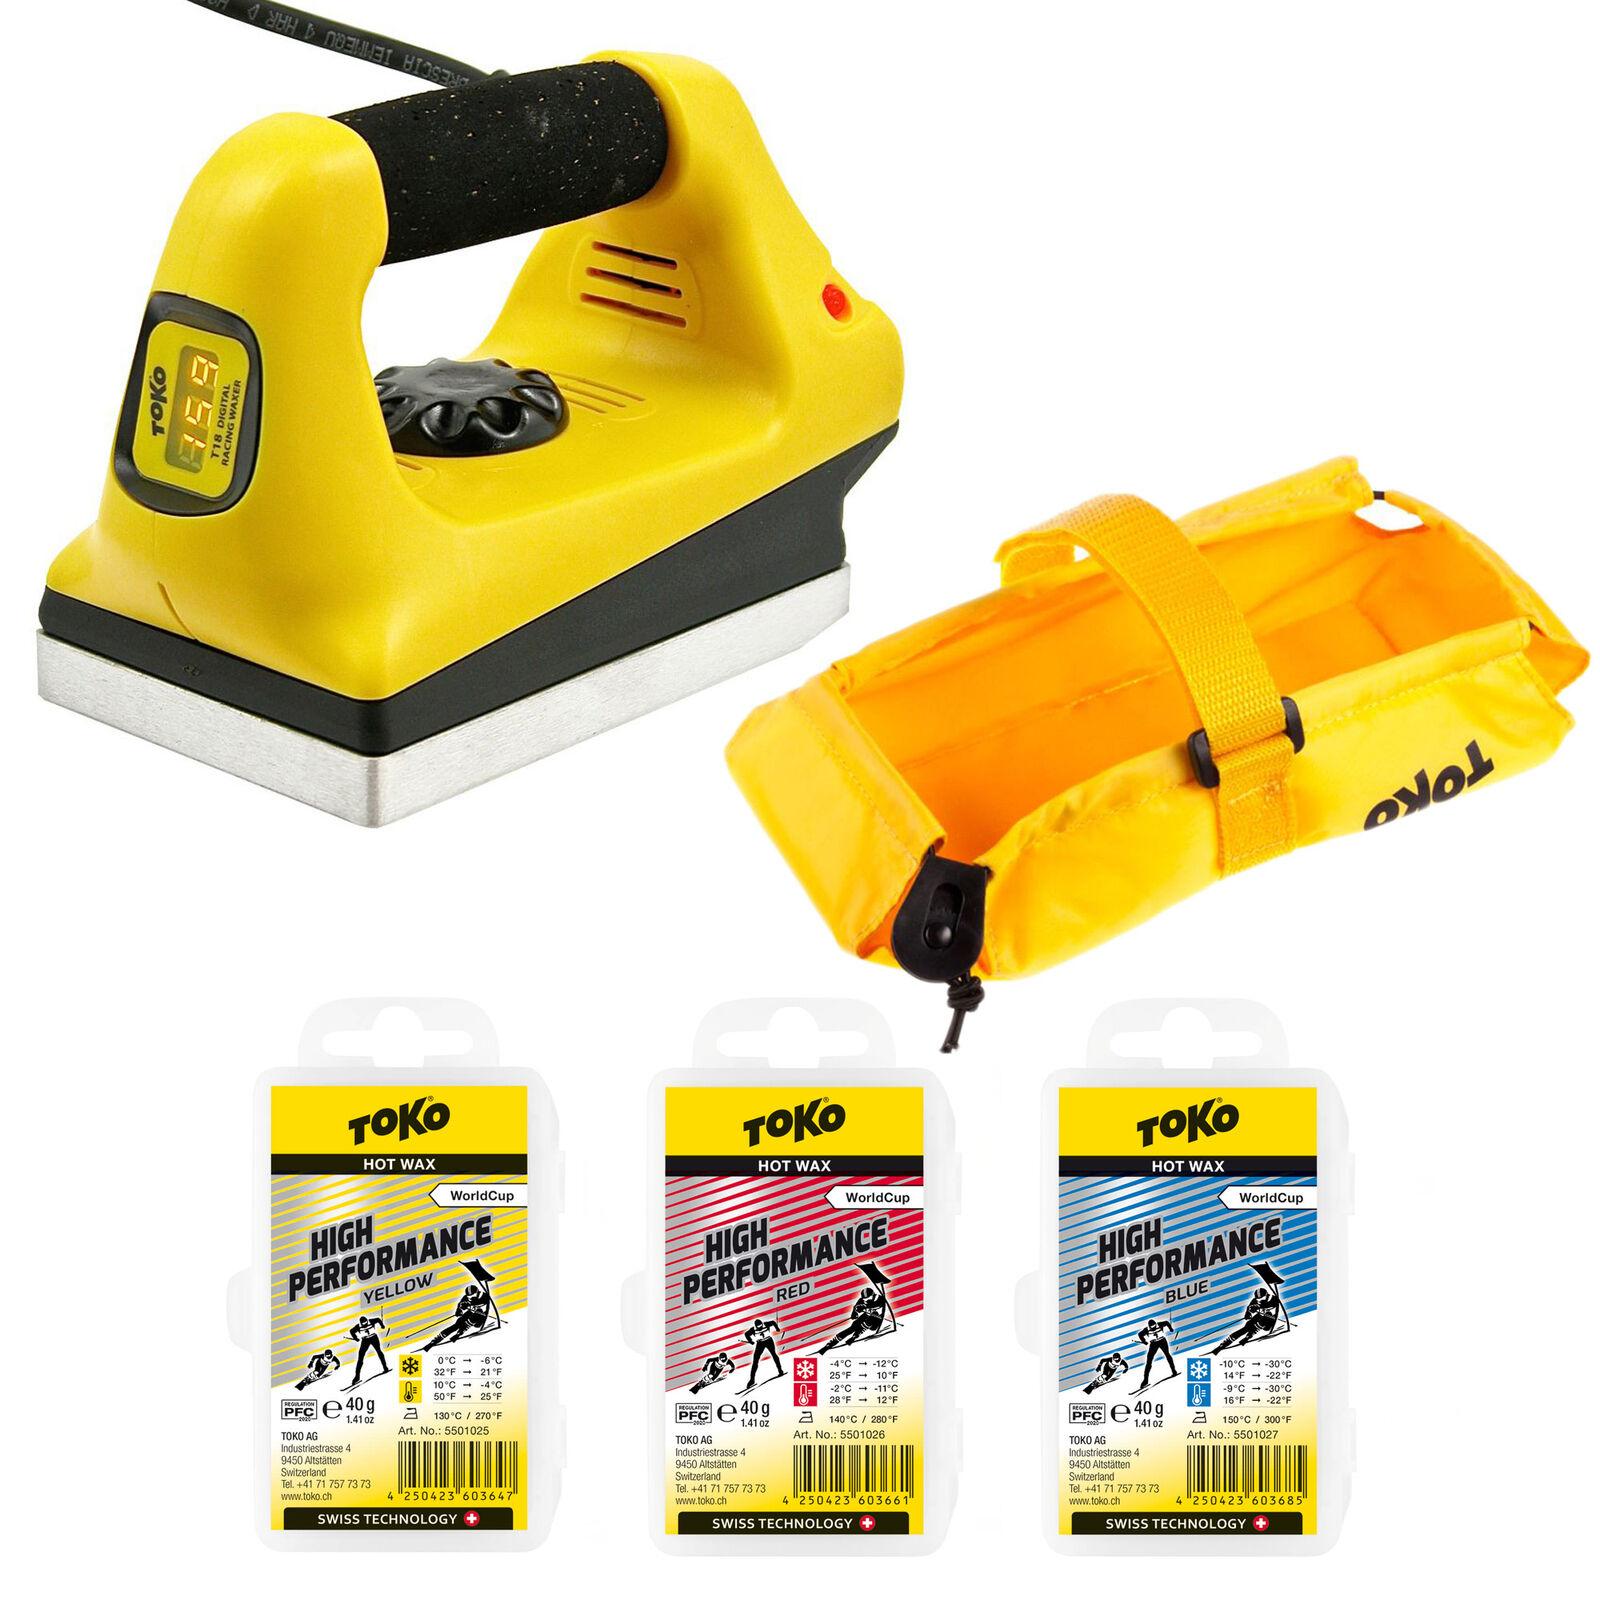 Toko T18 World Cup Digital Iron plus 3 Bars Toko High FluGold Racing Wax